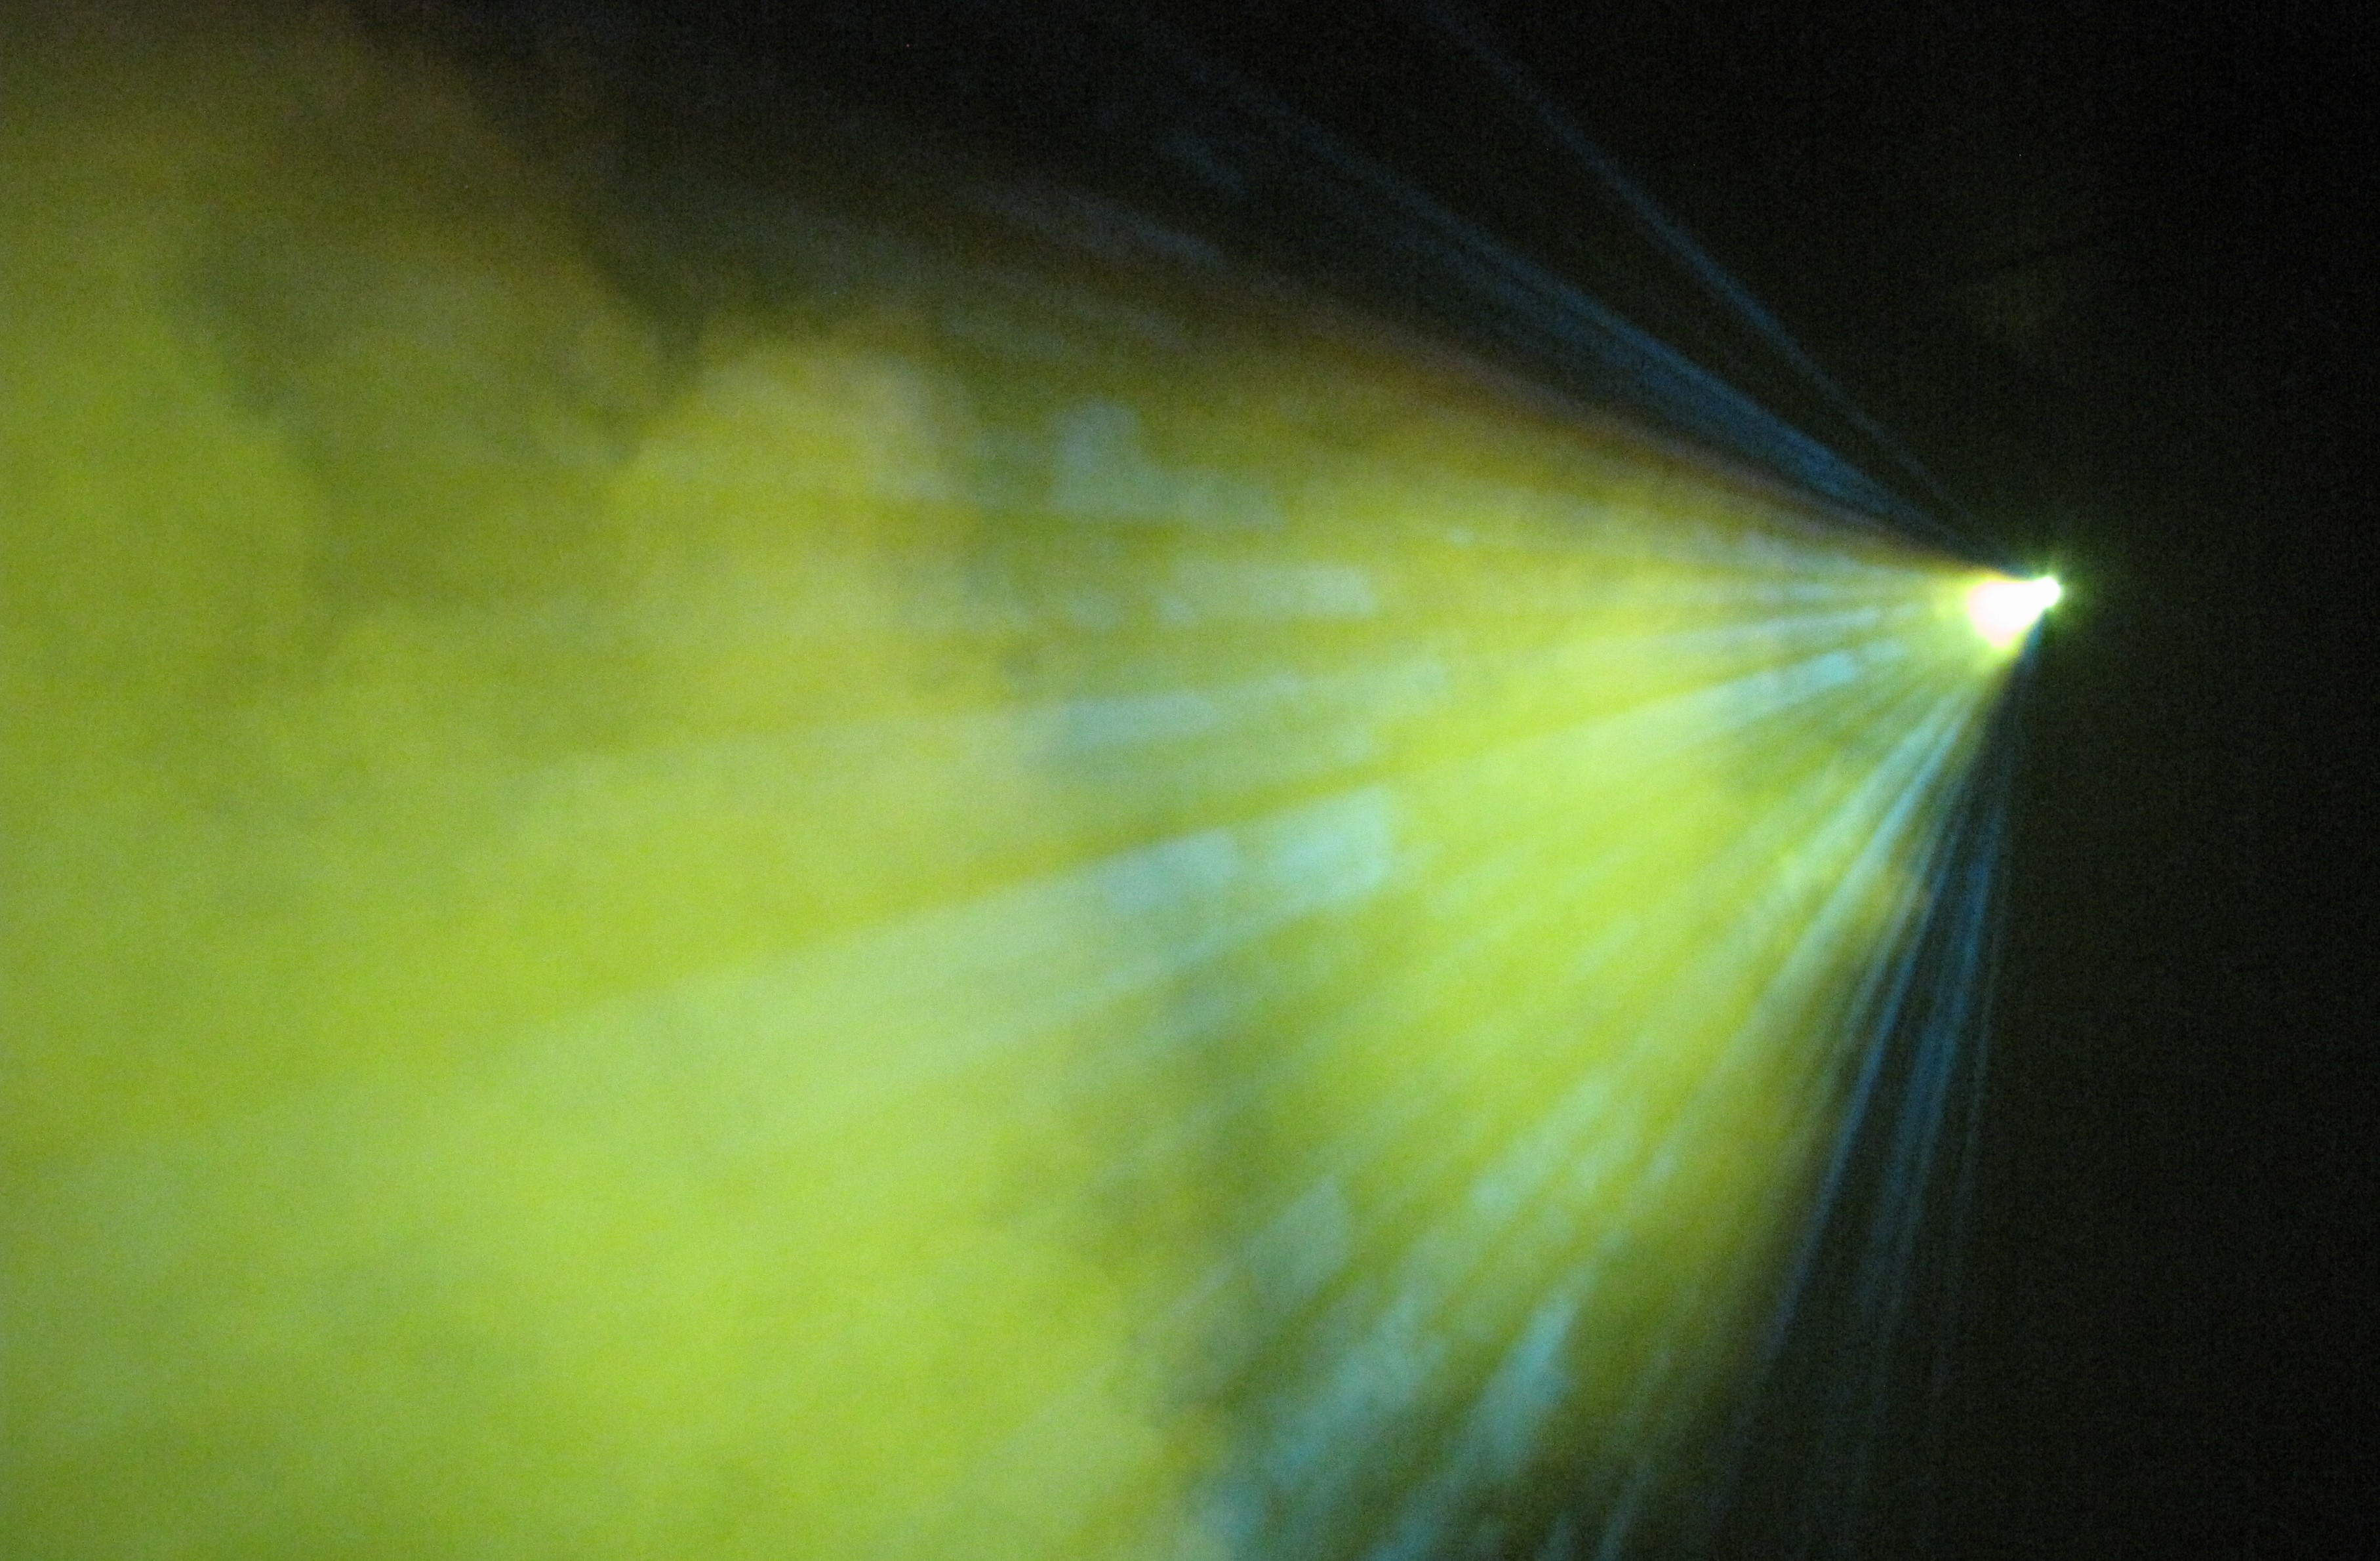 photo essay experiencing the ldquo horizon light rdquo uw college of arts sunny fog